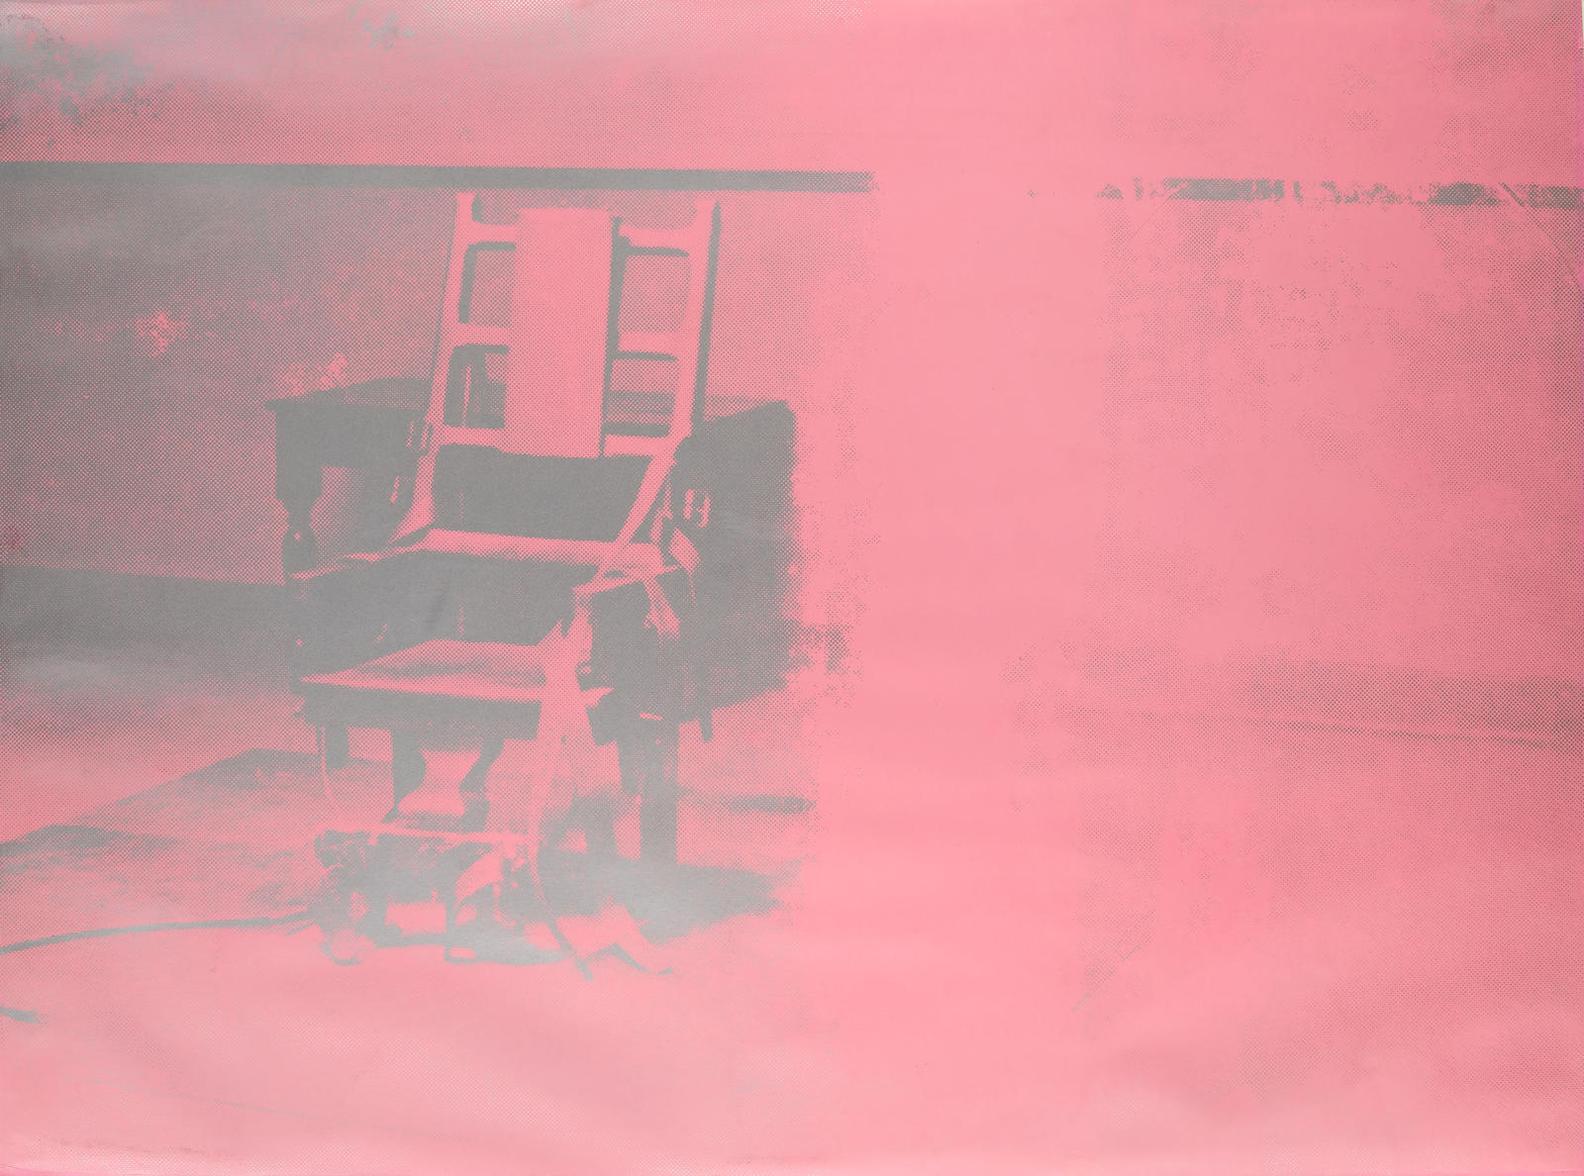 Andy Warhol-Electric Chair (F./S. II.75)-1971